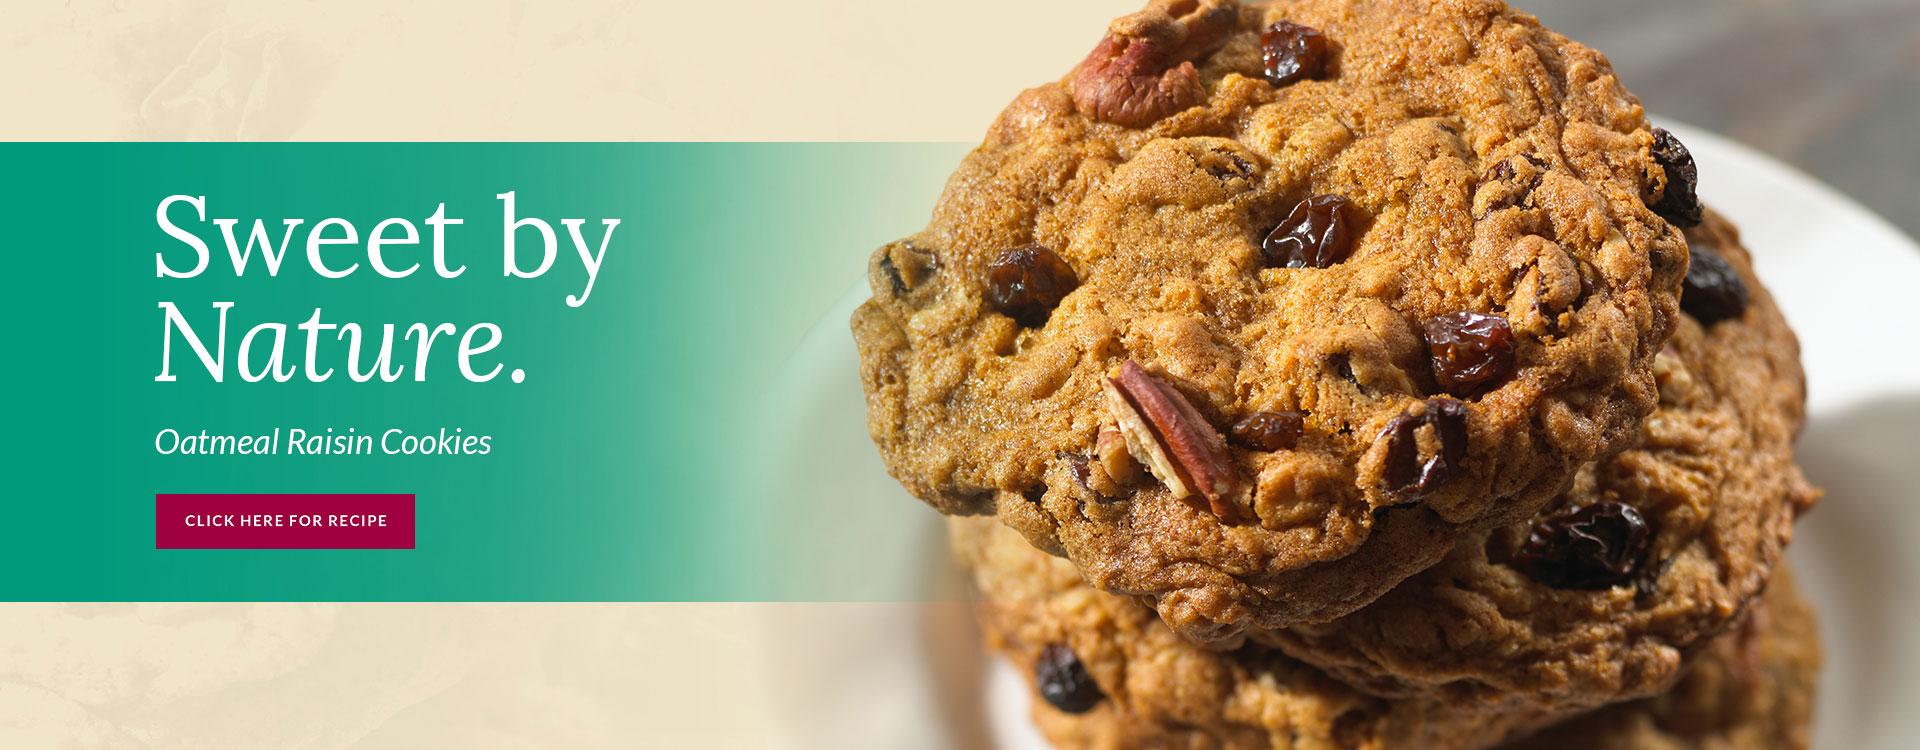 Our Growers Favorite Oatmeal Raisin Cookies